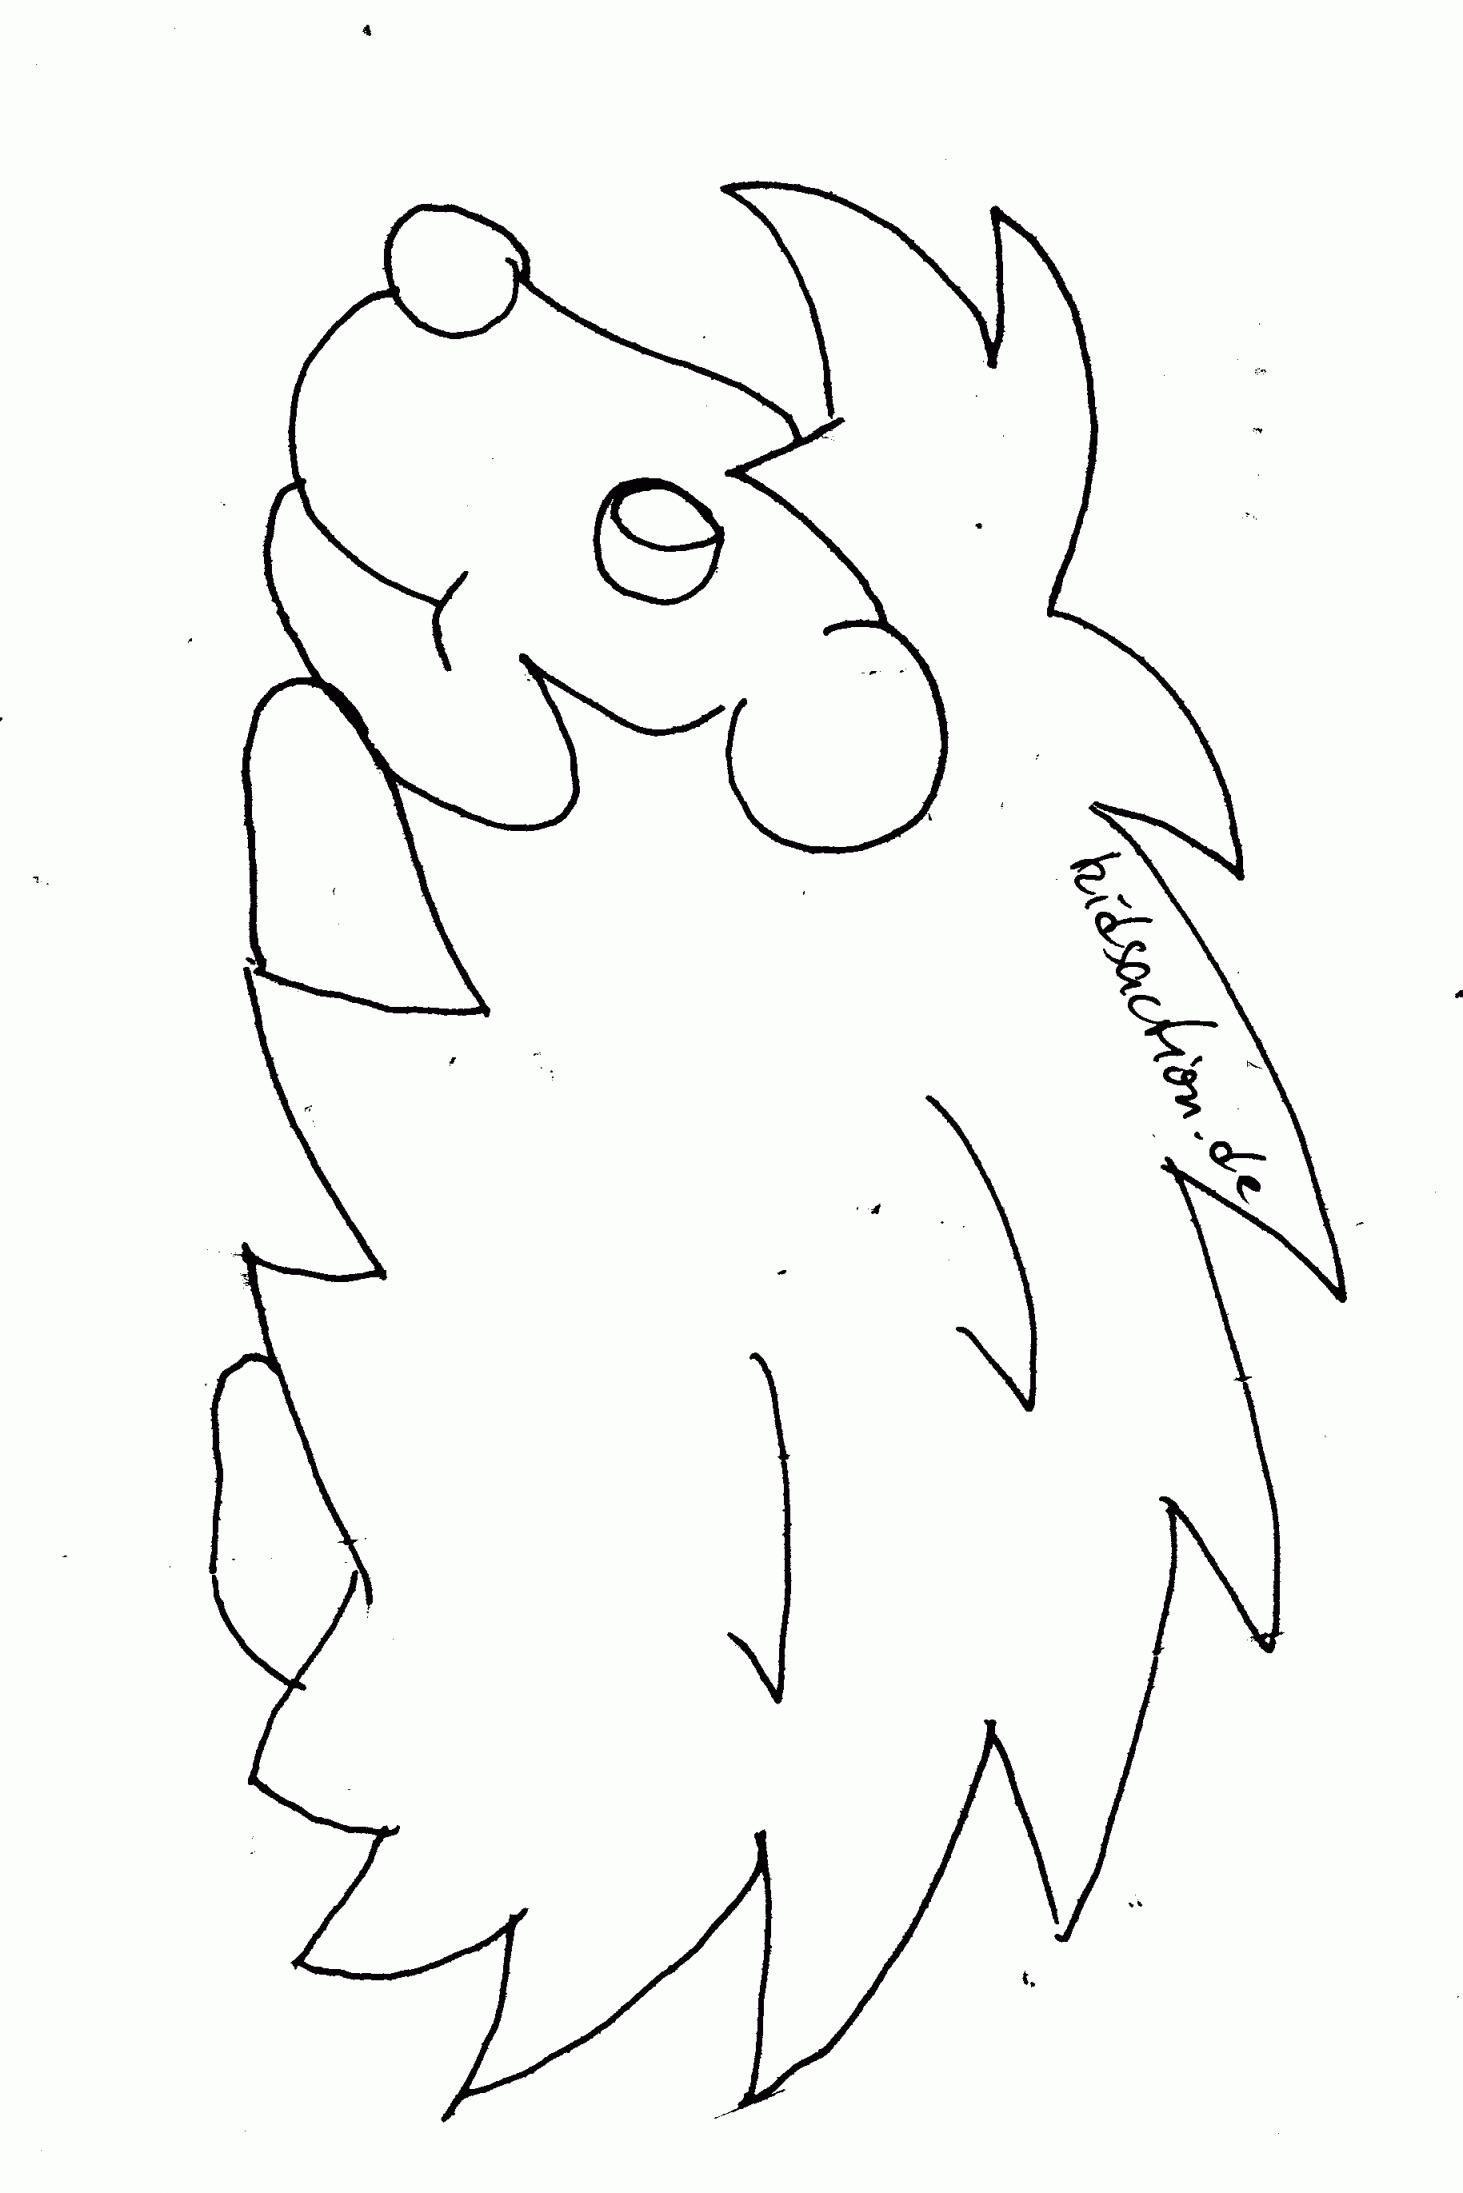 My Little Pony Ausmalbild Einzigartig Malvorlagen Igel Elegant Igel Grundschule 0d Archives Uploadertalk Sammlung